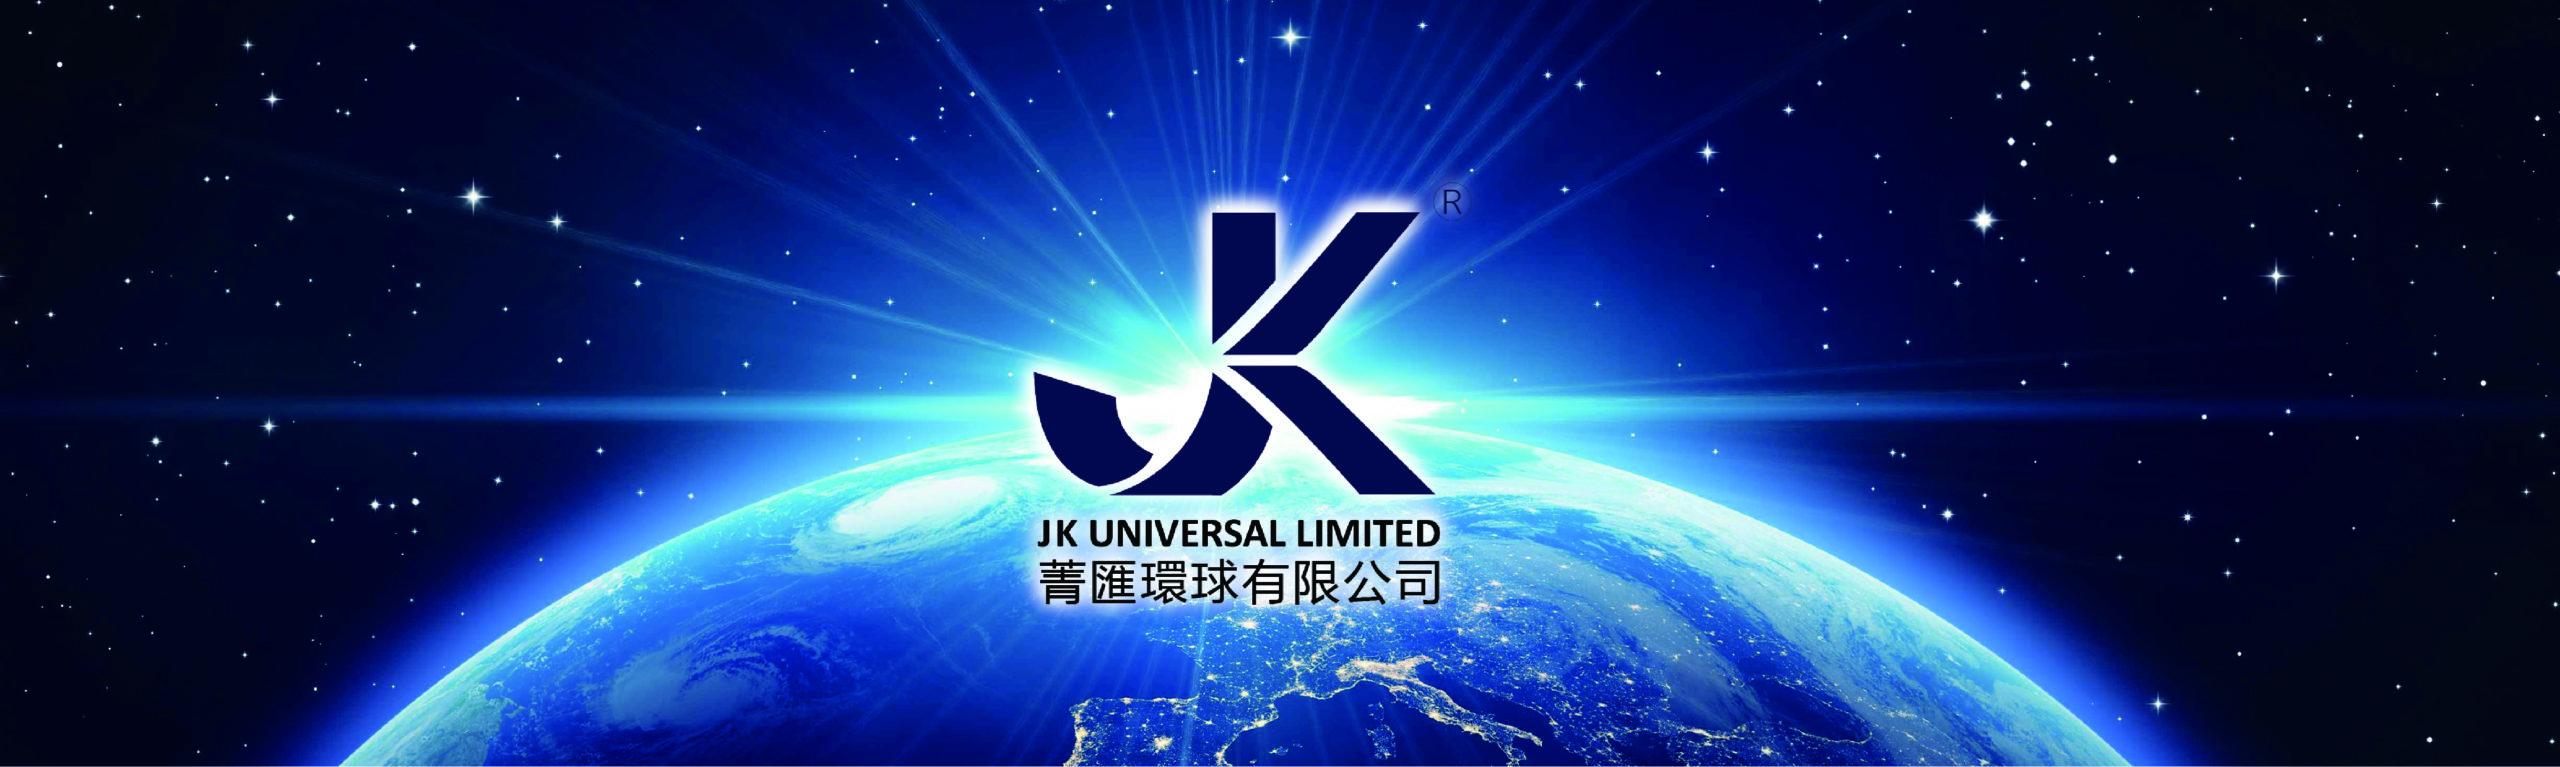 JK-Universal